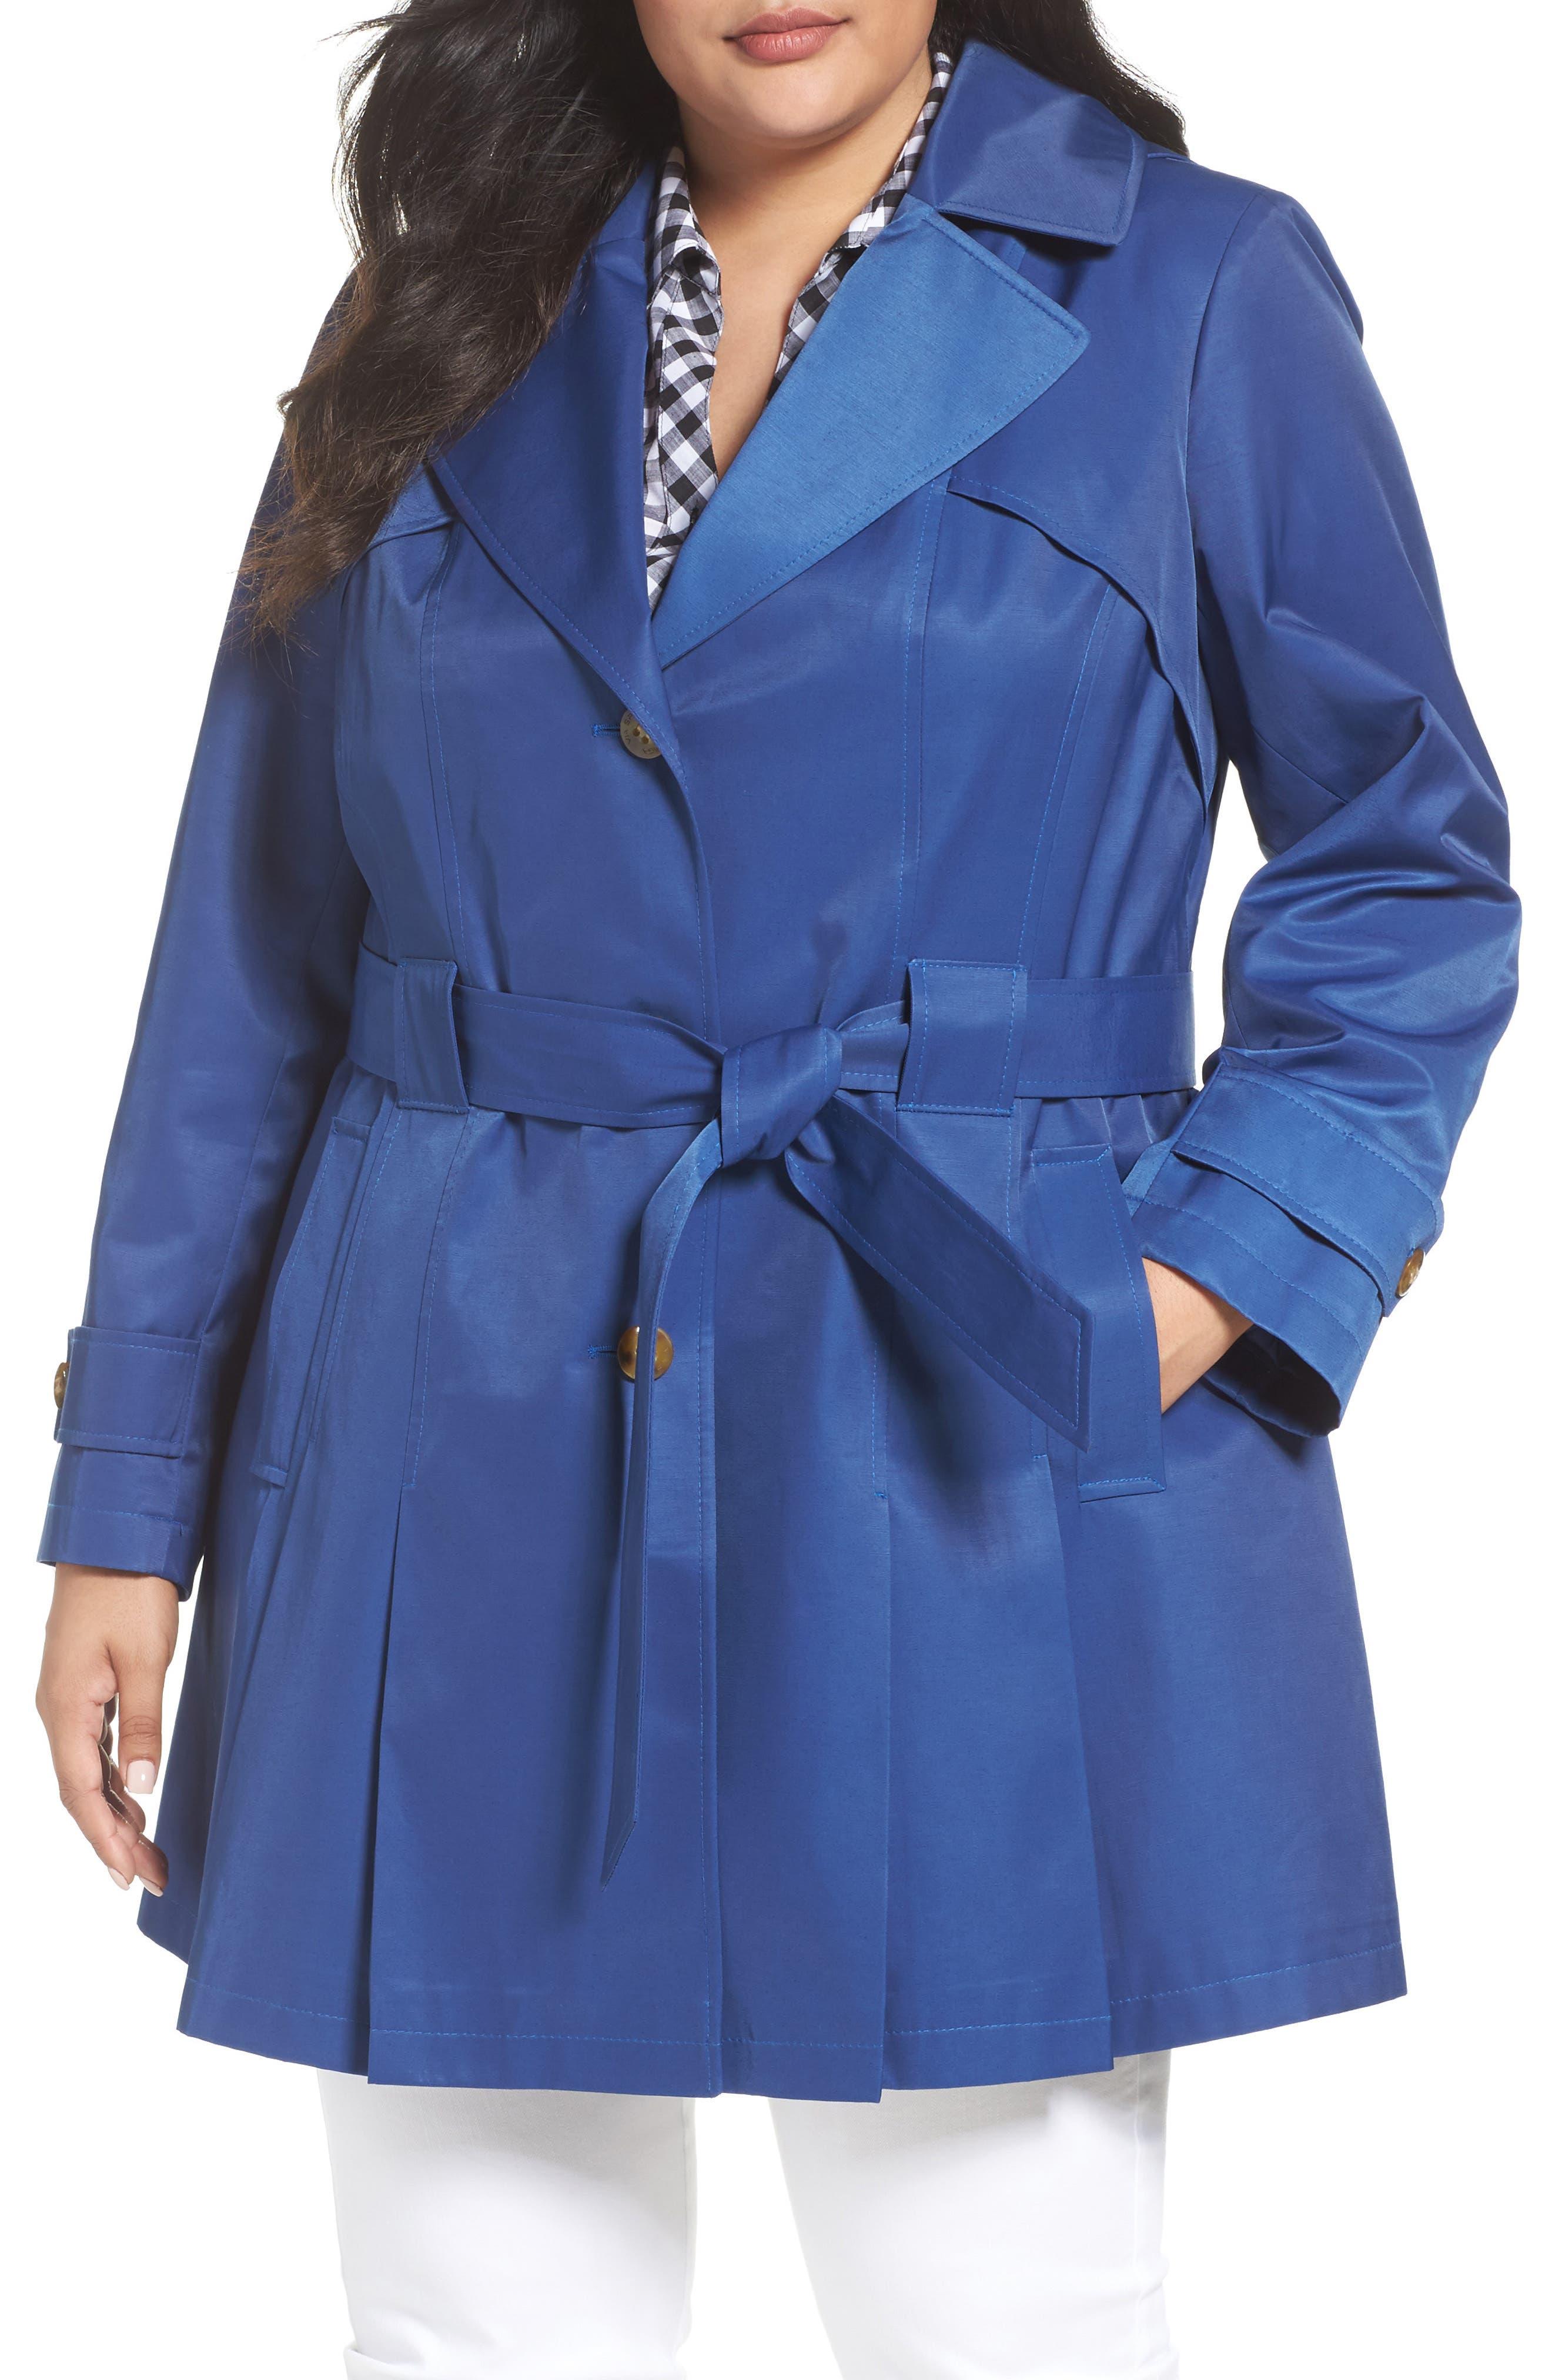 'Scarpa' Single Breasted Trench Coat,                             Main thumbnail 4, color,